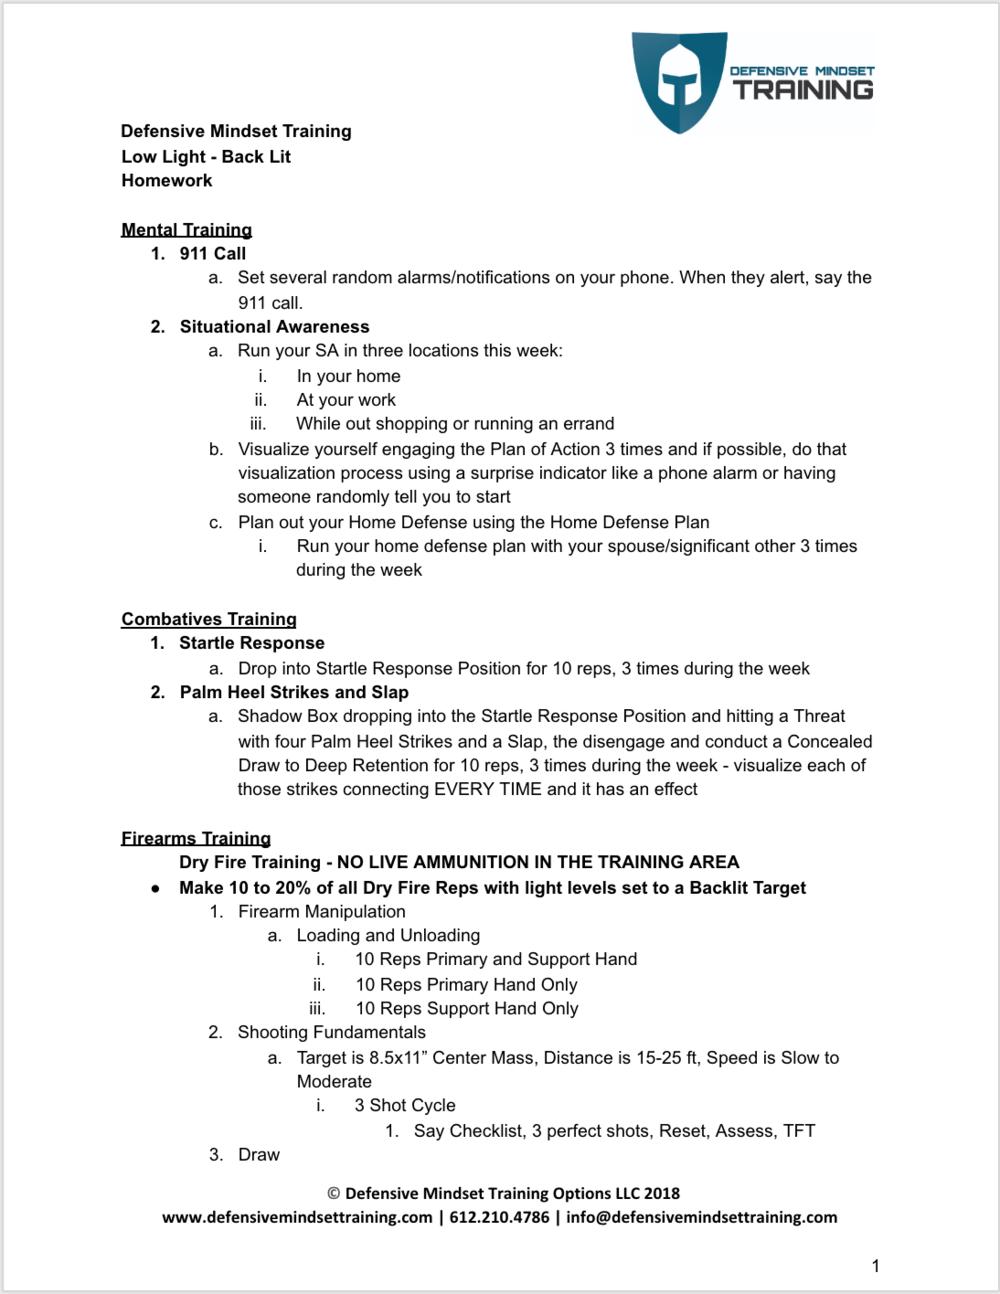 Low Light - Back Lit - Homework p 1